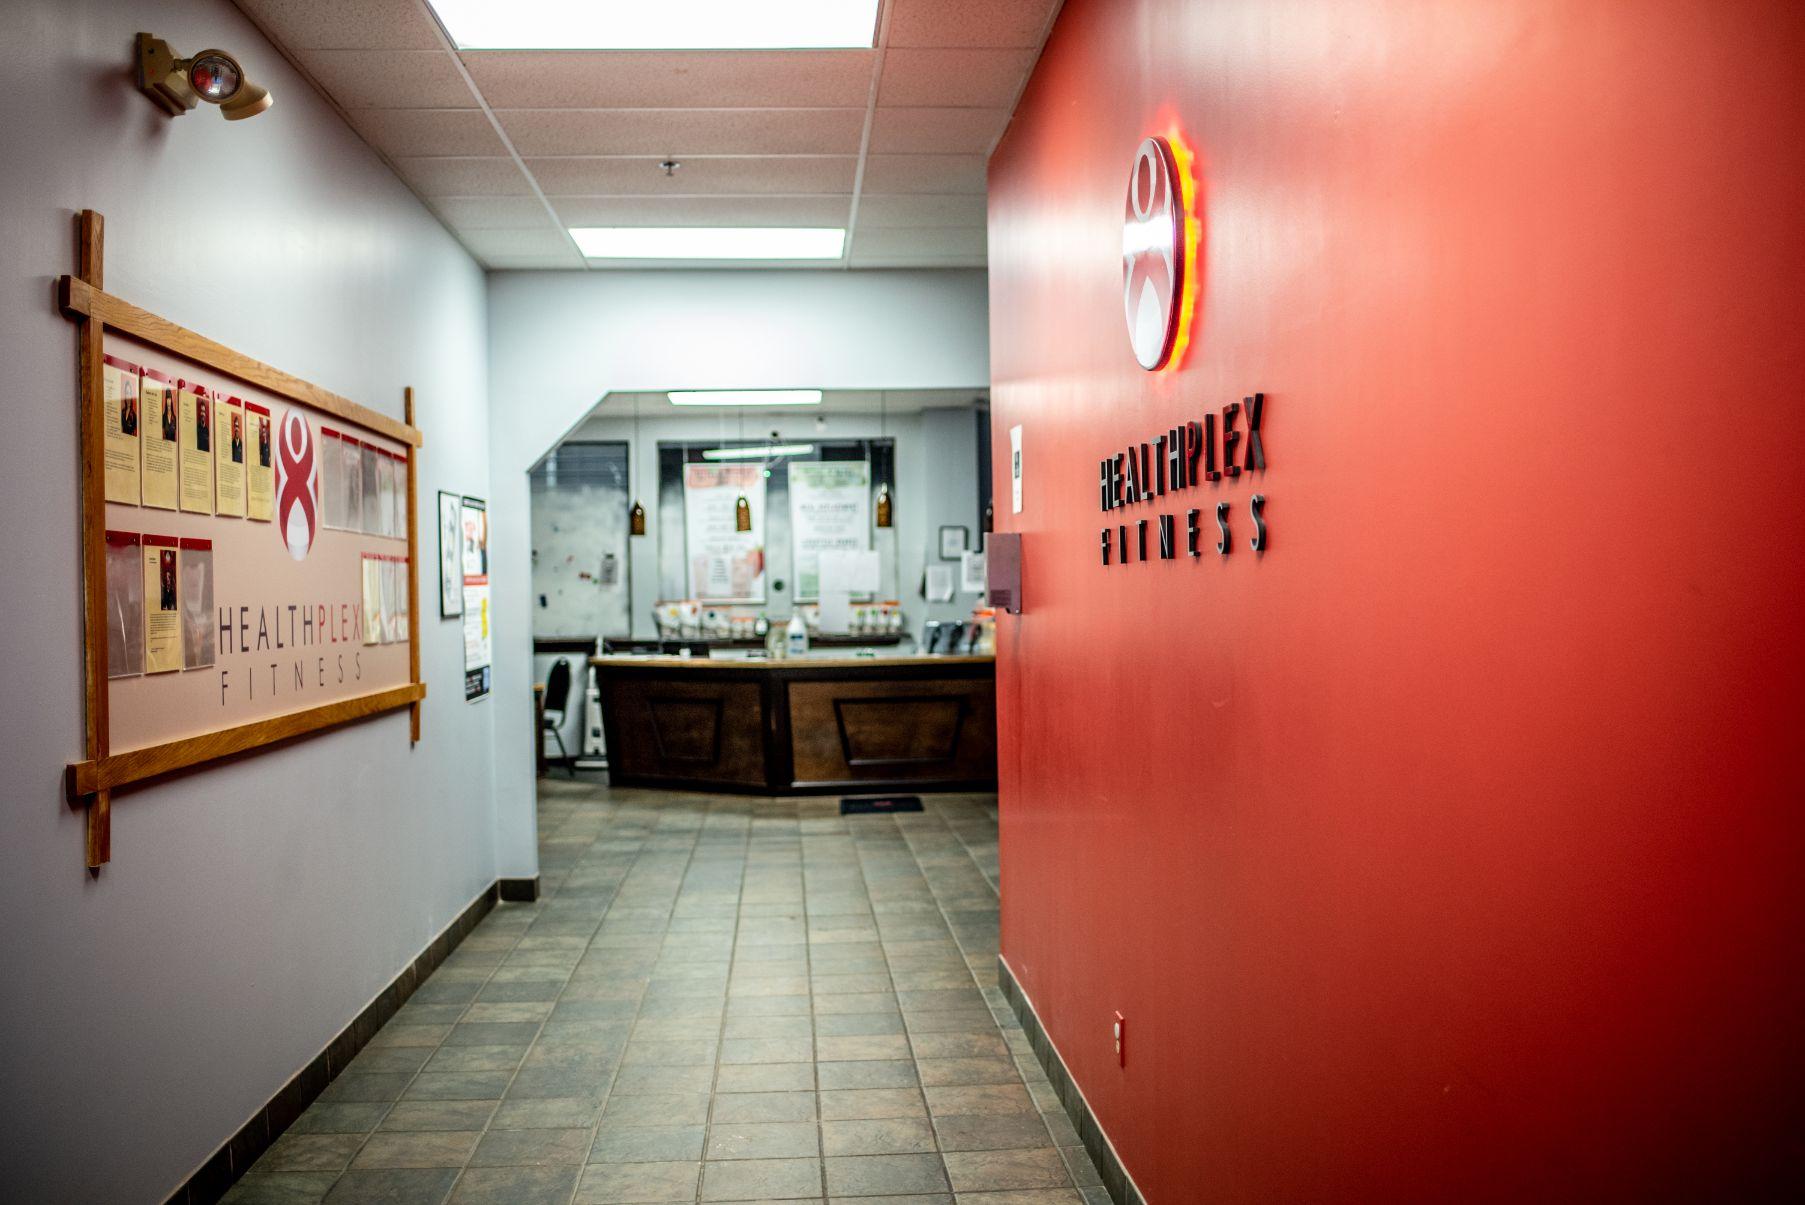 Healthplex Fitness Clifton Park NY Our Gym